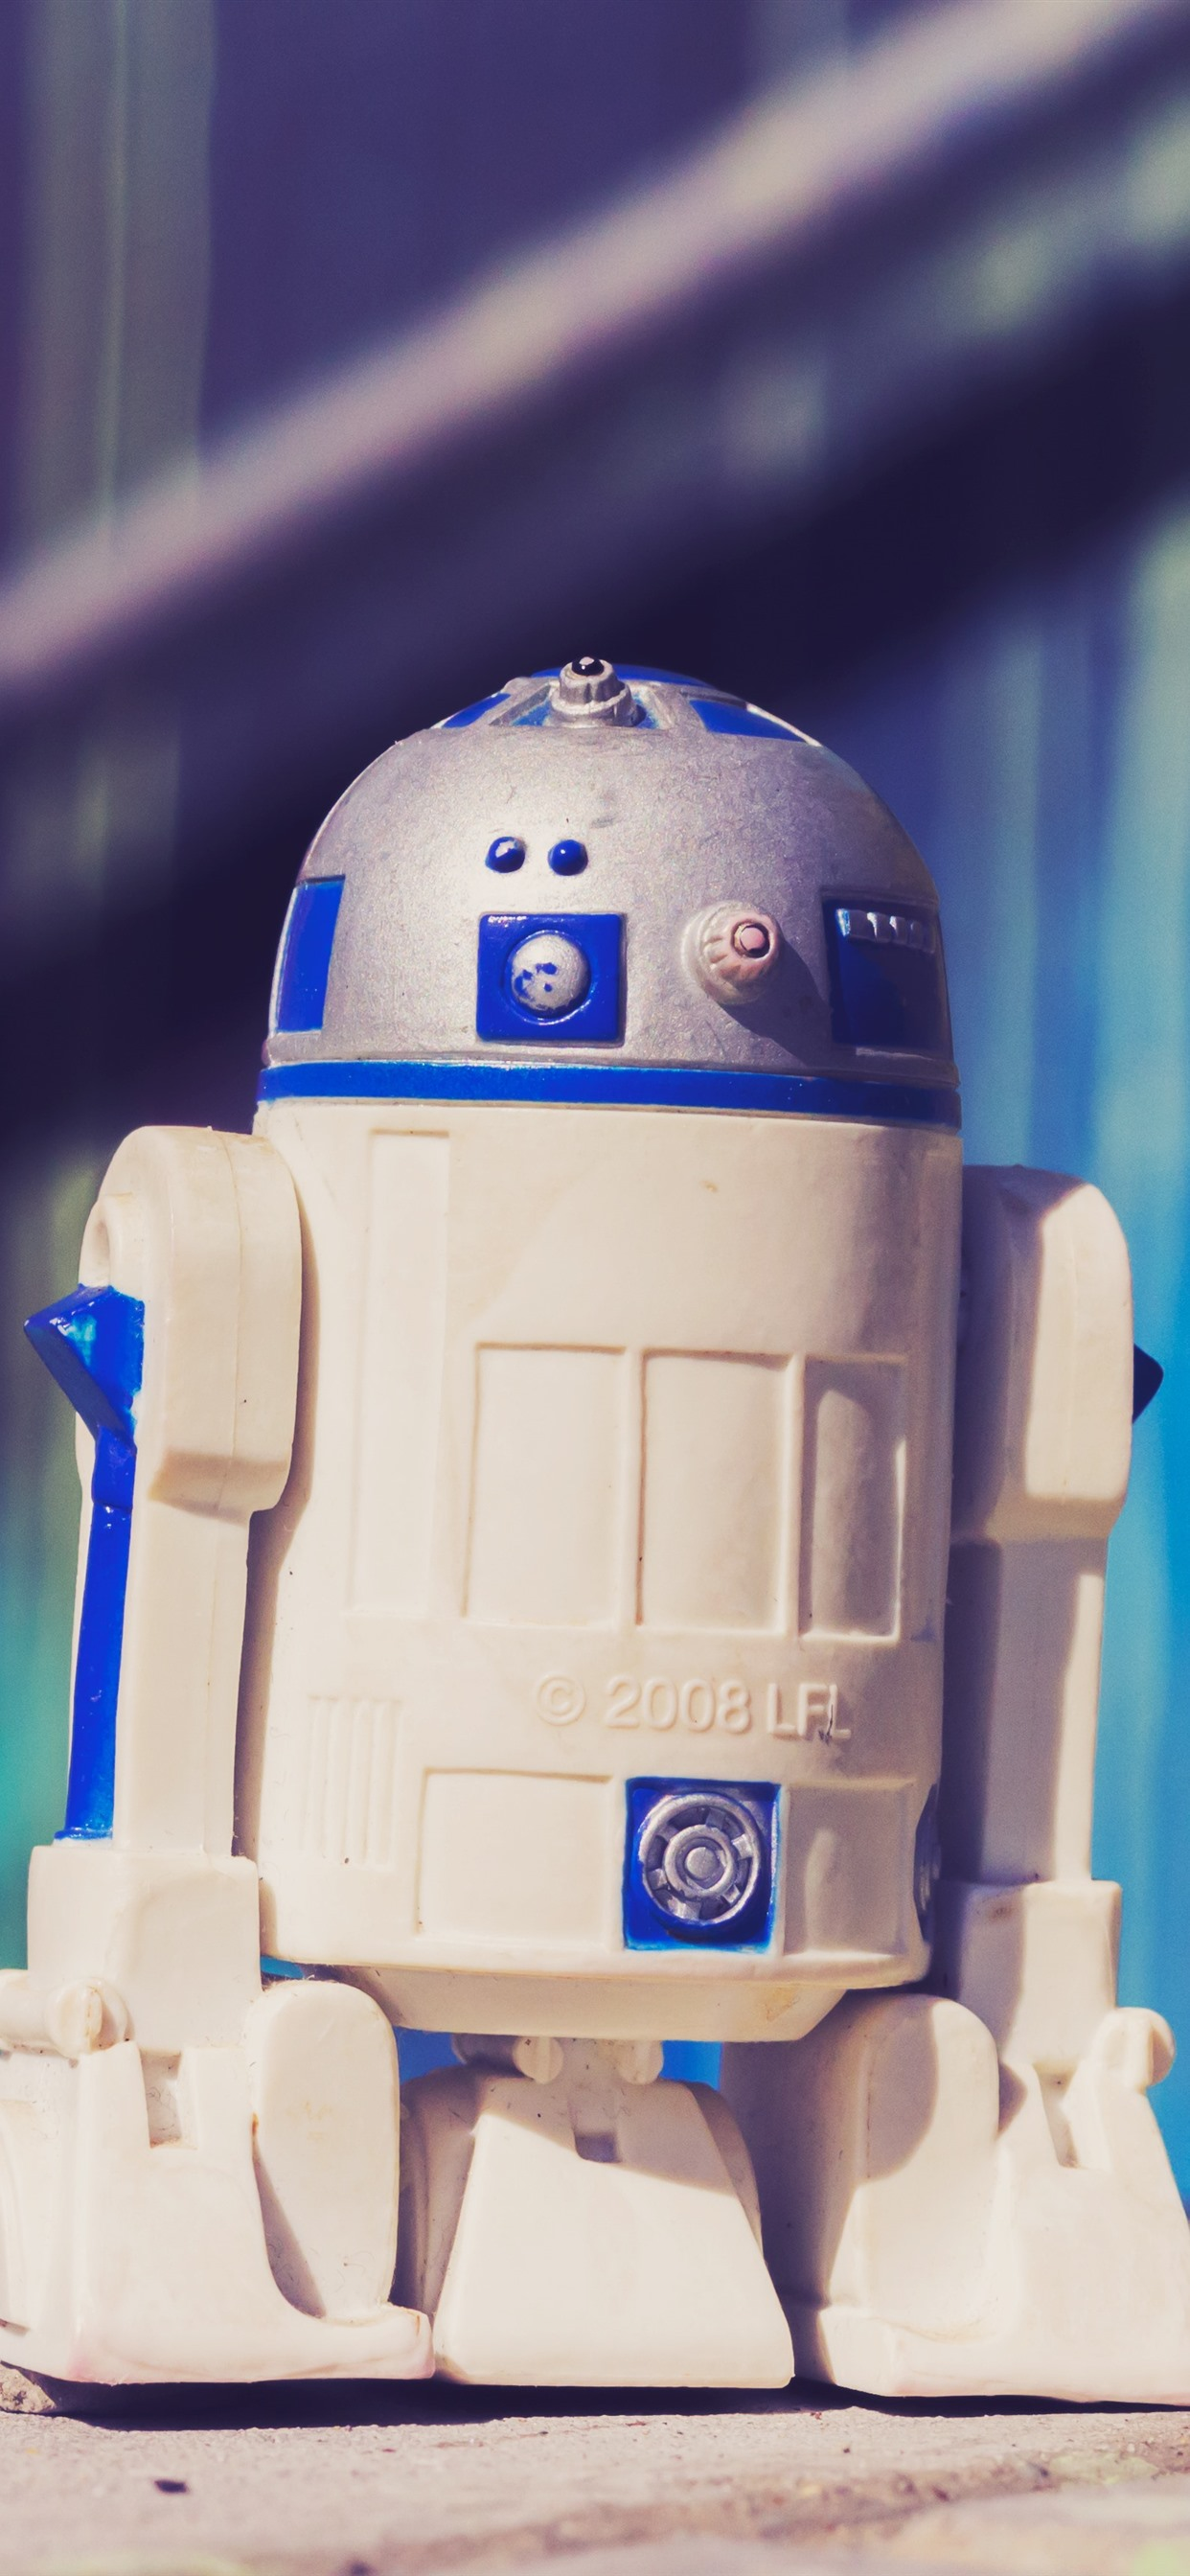 R2 D2ロボット玩具 1242x2688 Iphone 11 Pro Xs Max 壁紙 背景 画像